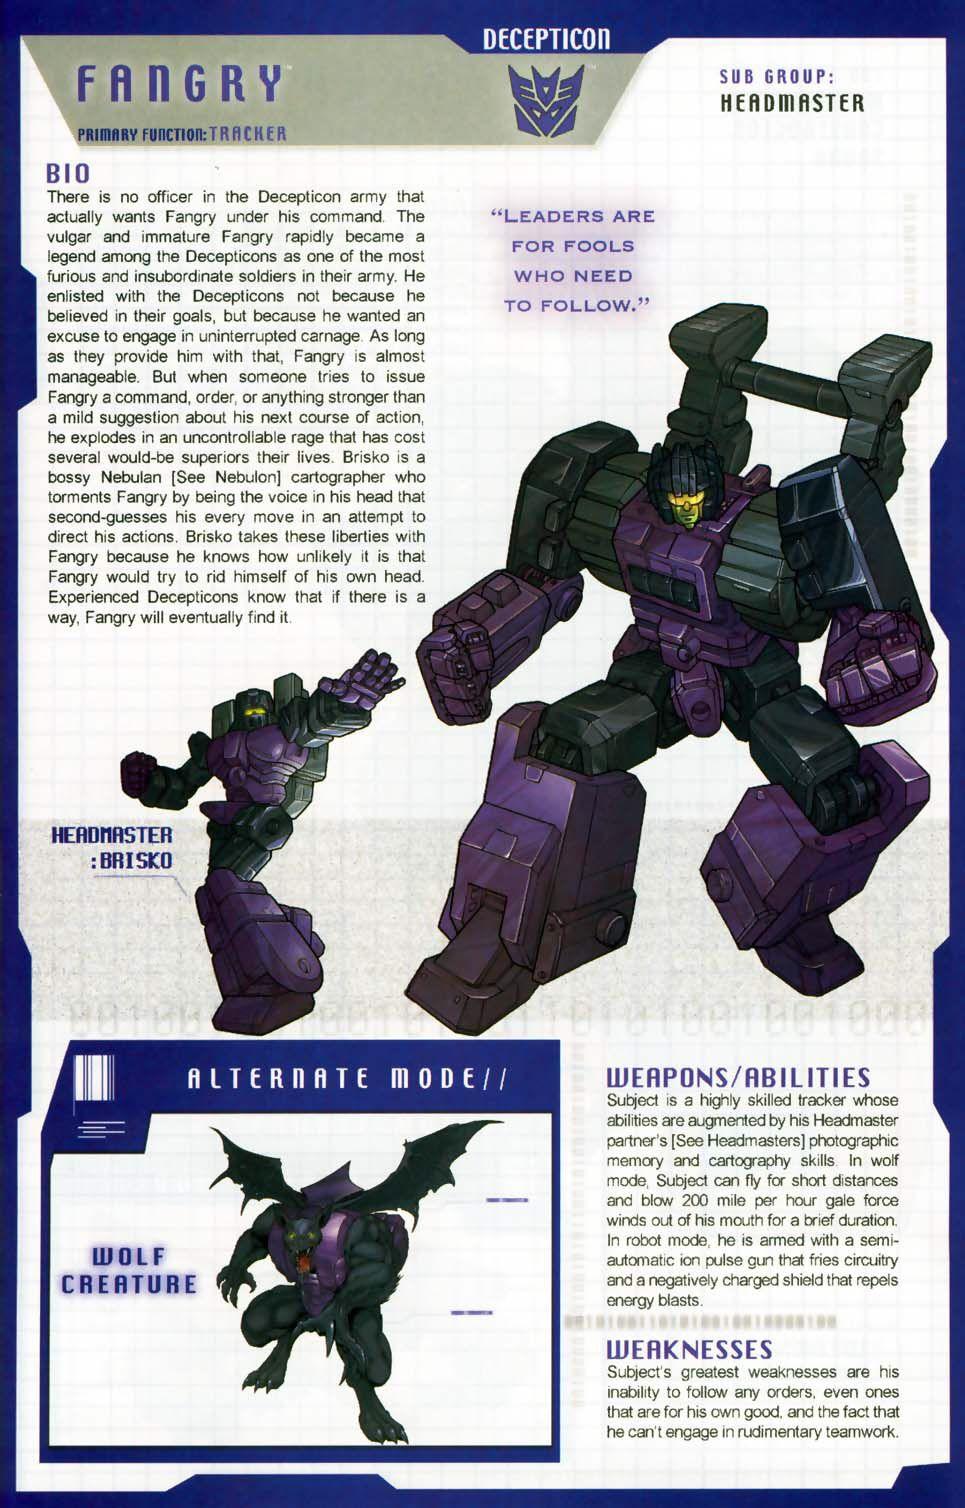 Transformers: Decepticon - Headmaster - Fangry w/ Brisco